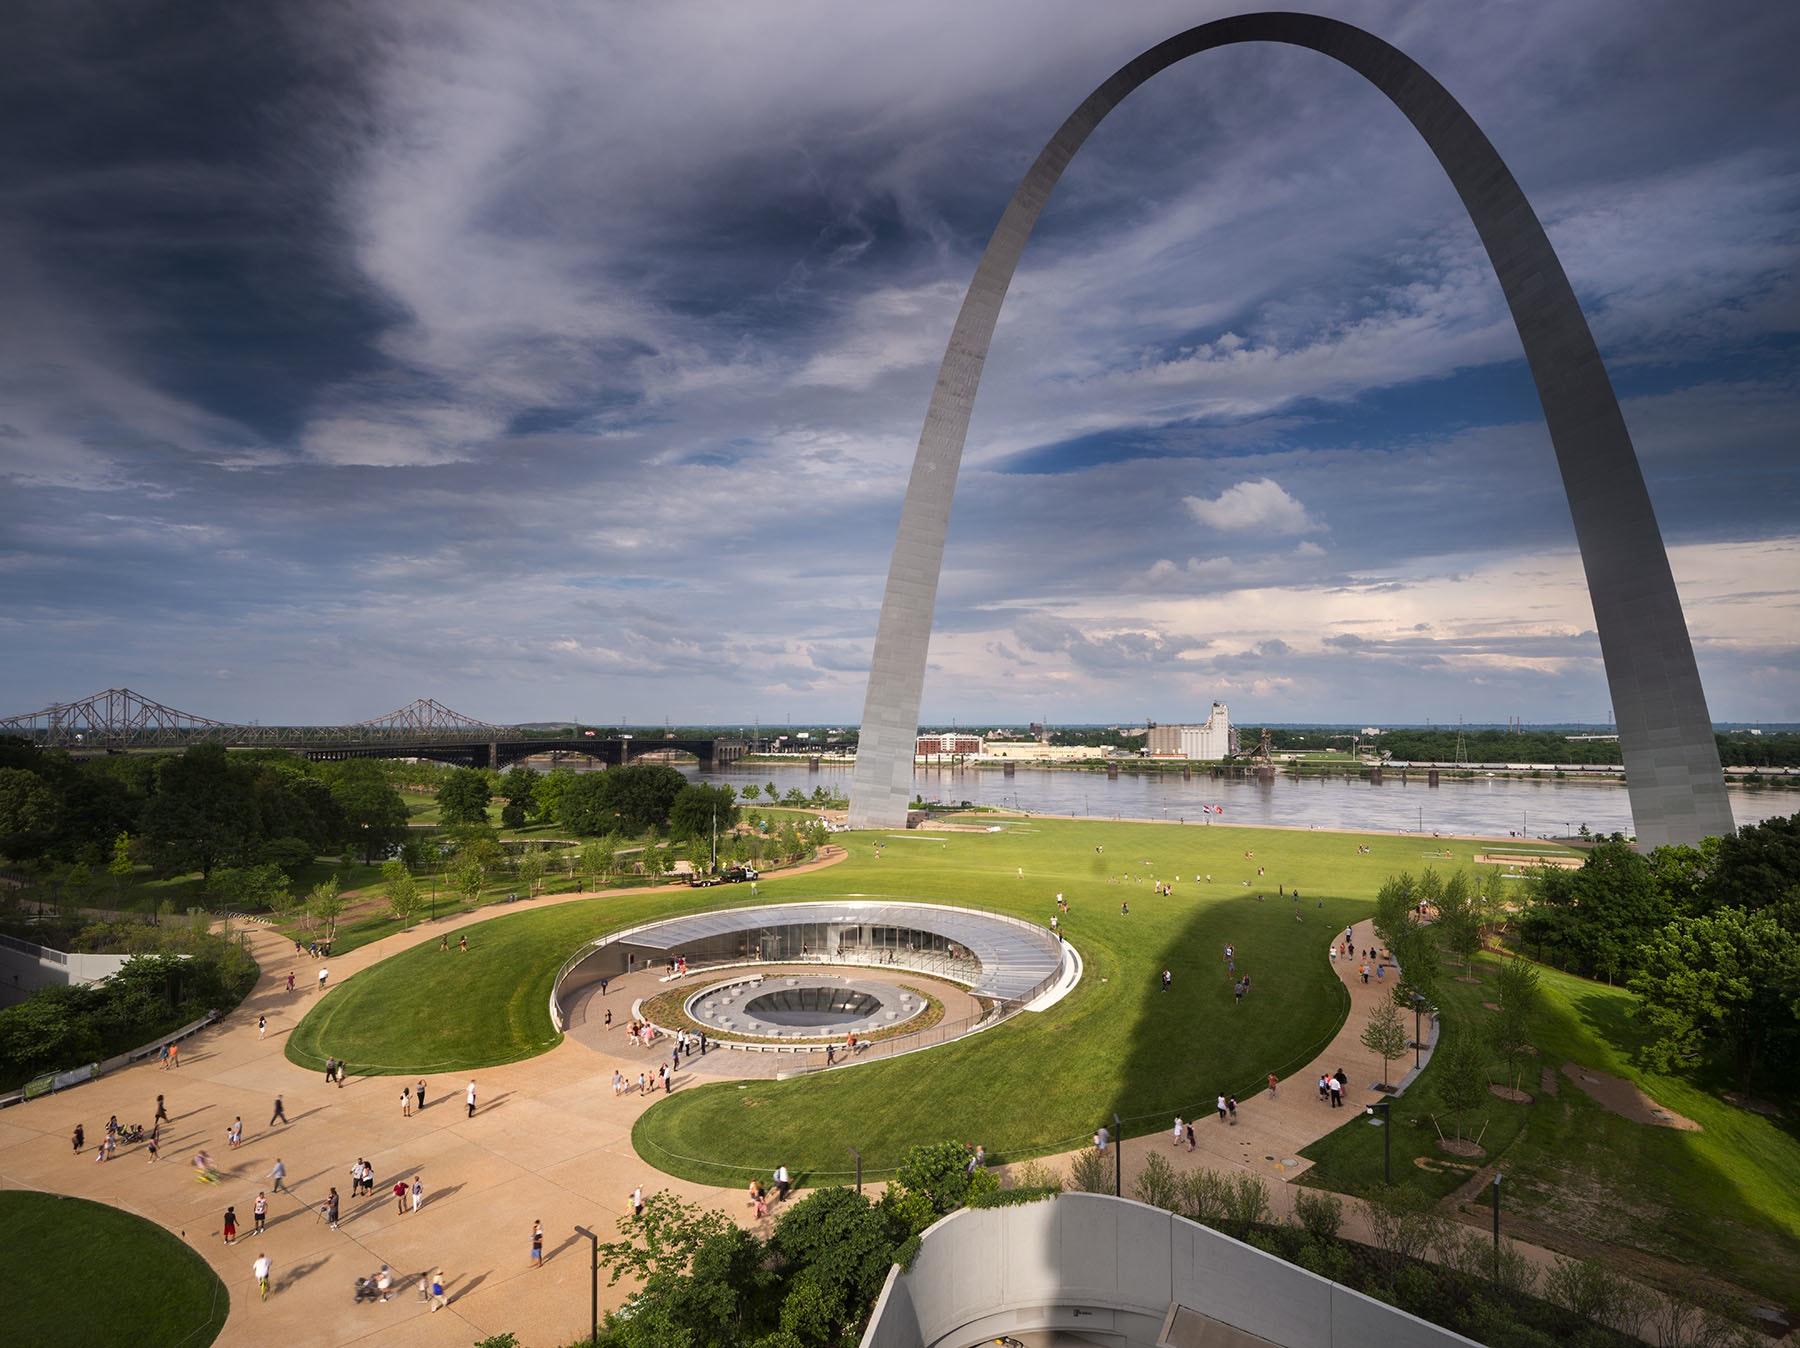 Cooper Robertson emphasizes Universal Design in new Gateway Arch Museum